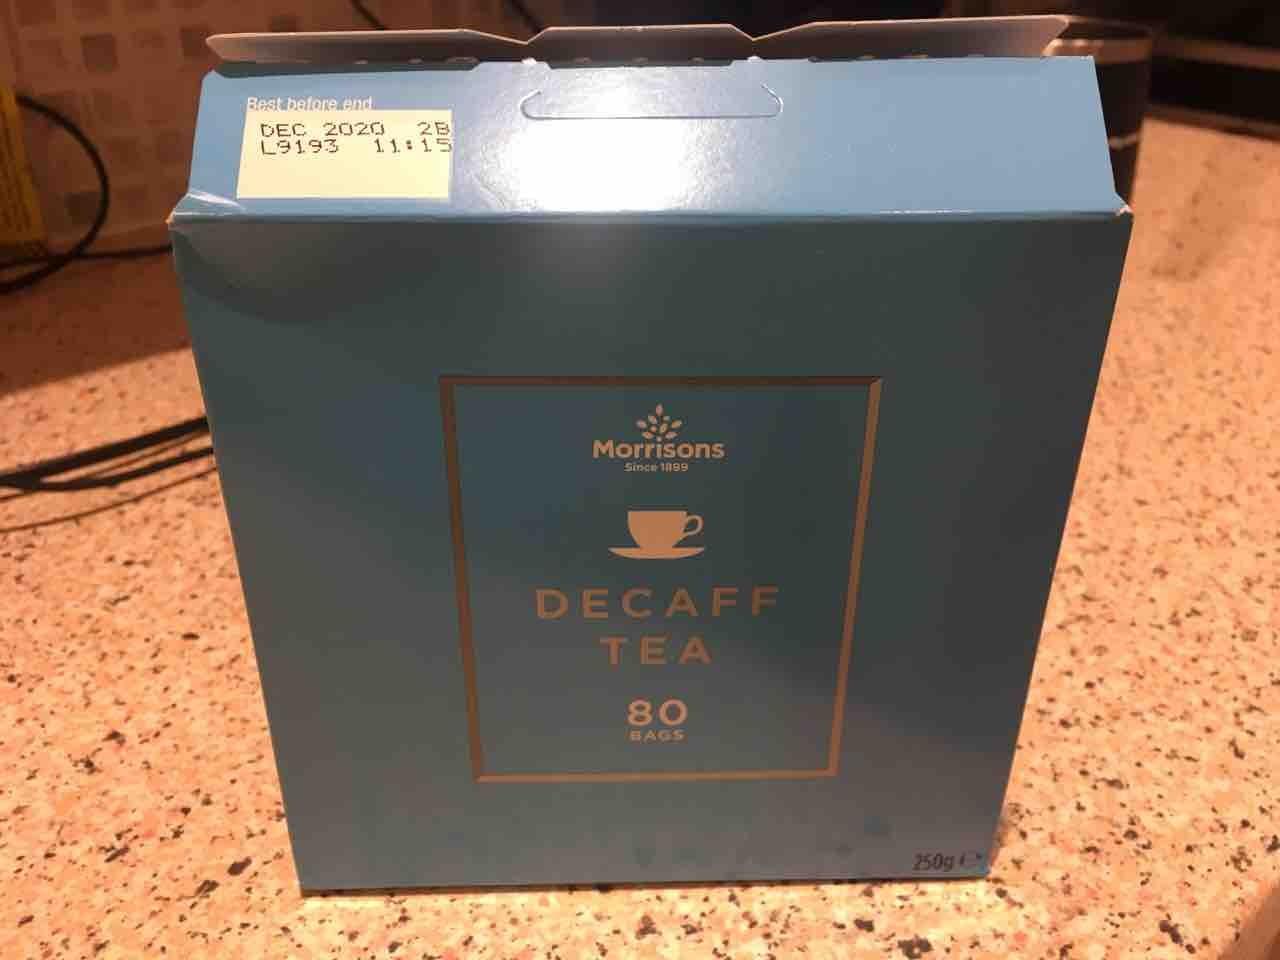 Decaff tea bags